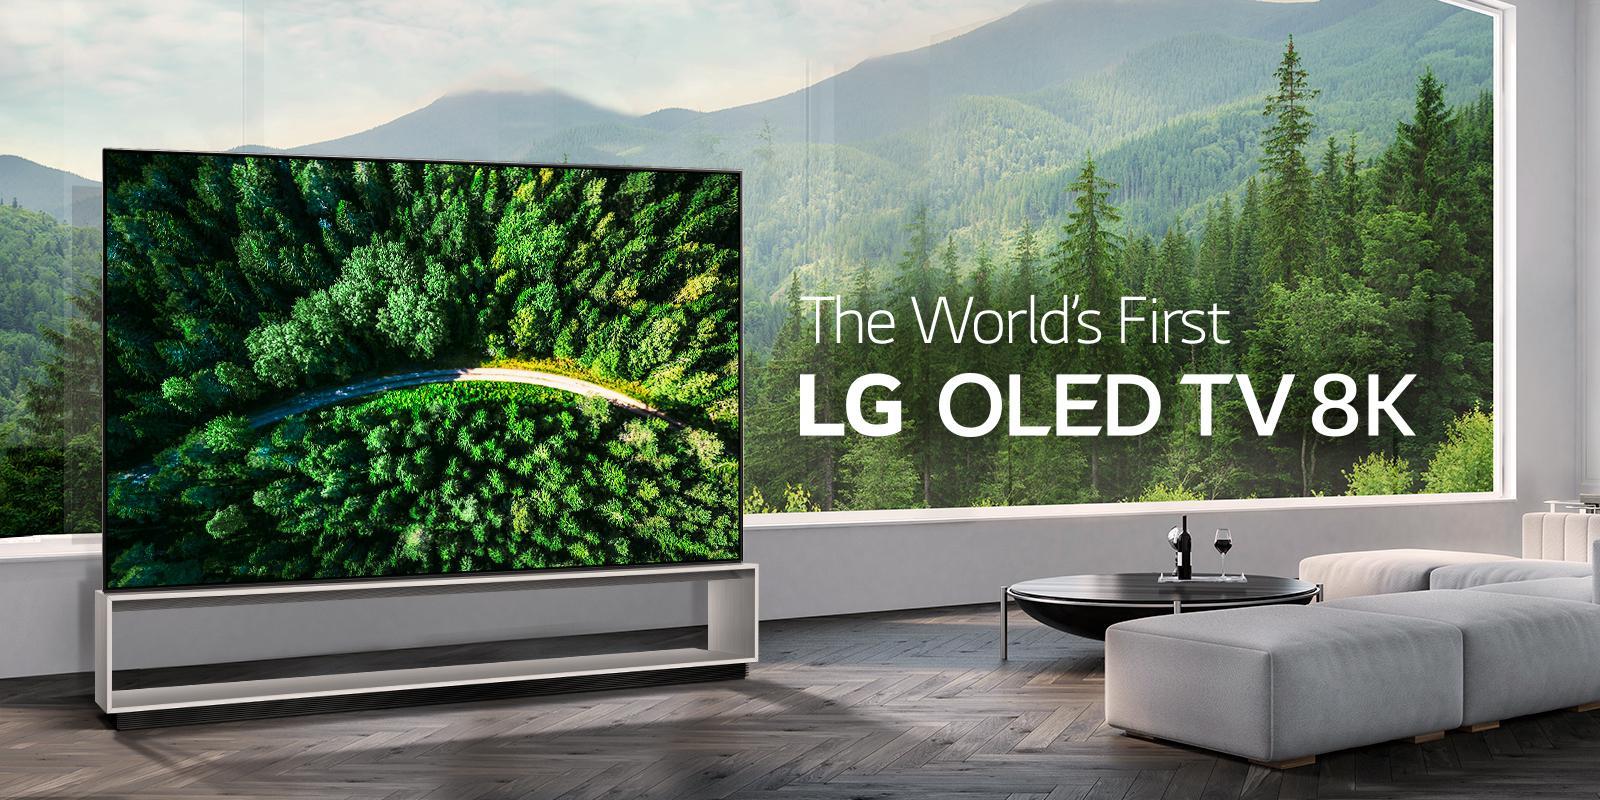 Lg 8k Tvs Discover The World S First Lg Oled Tv 8k Lg Usa